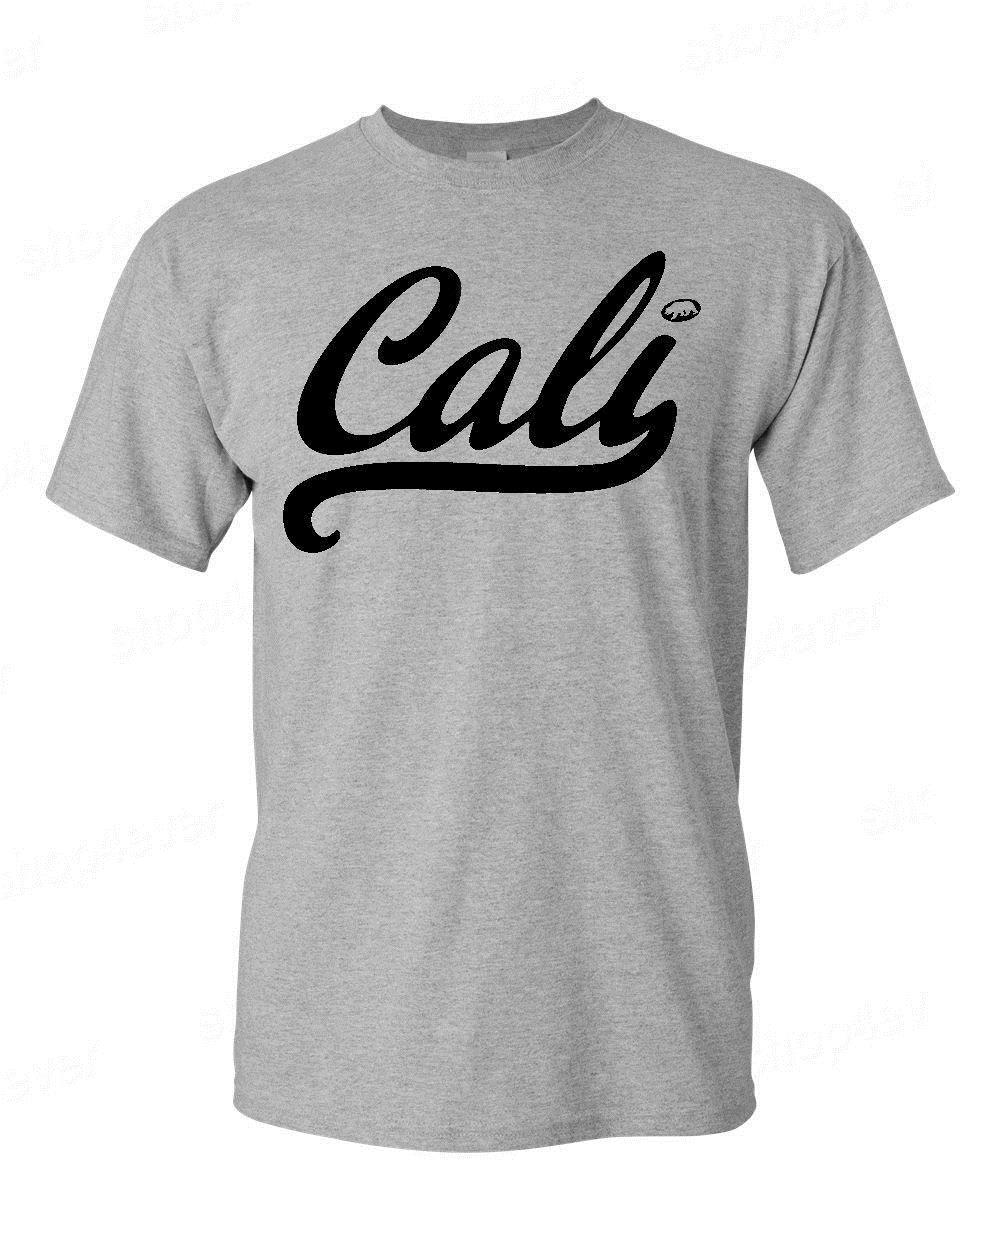 Quality T Shirts Printing T Shirt Short O Neck Christmas Cali Black